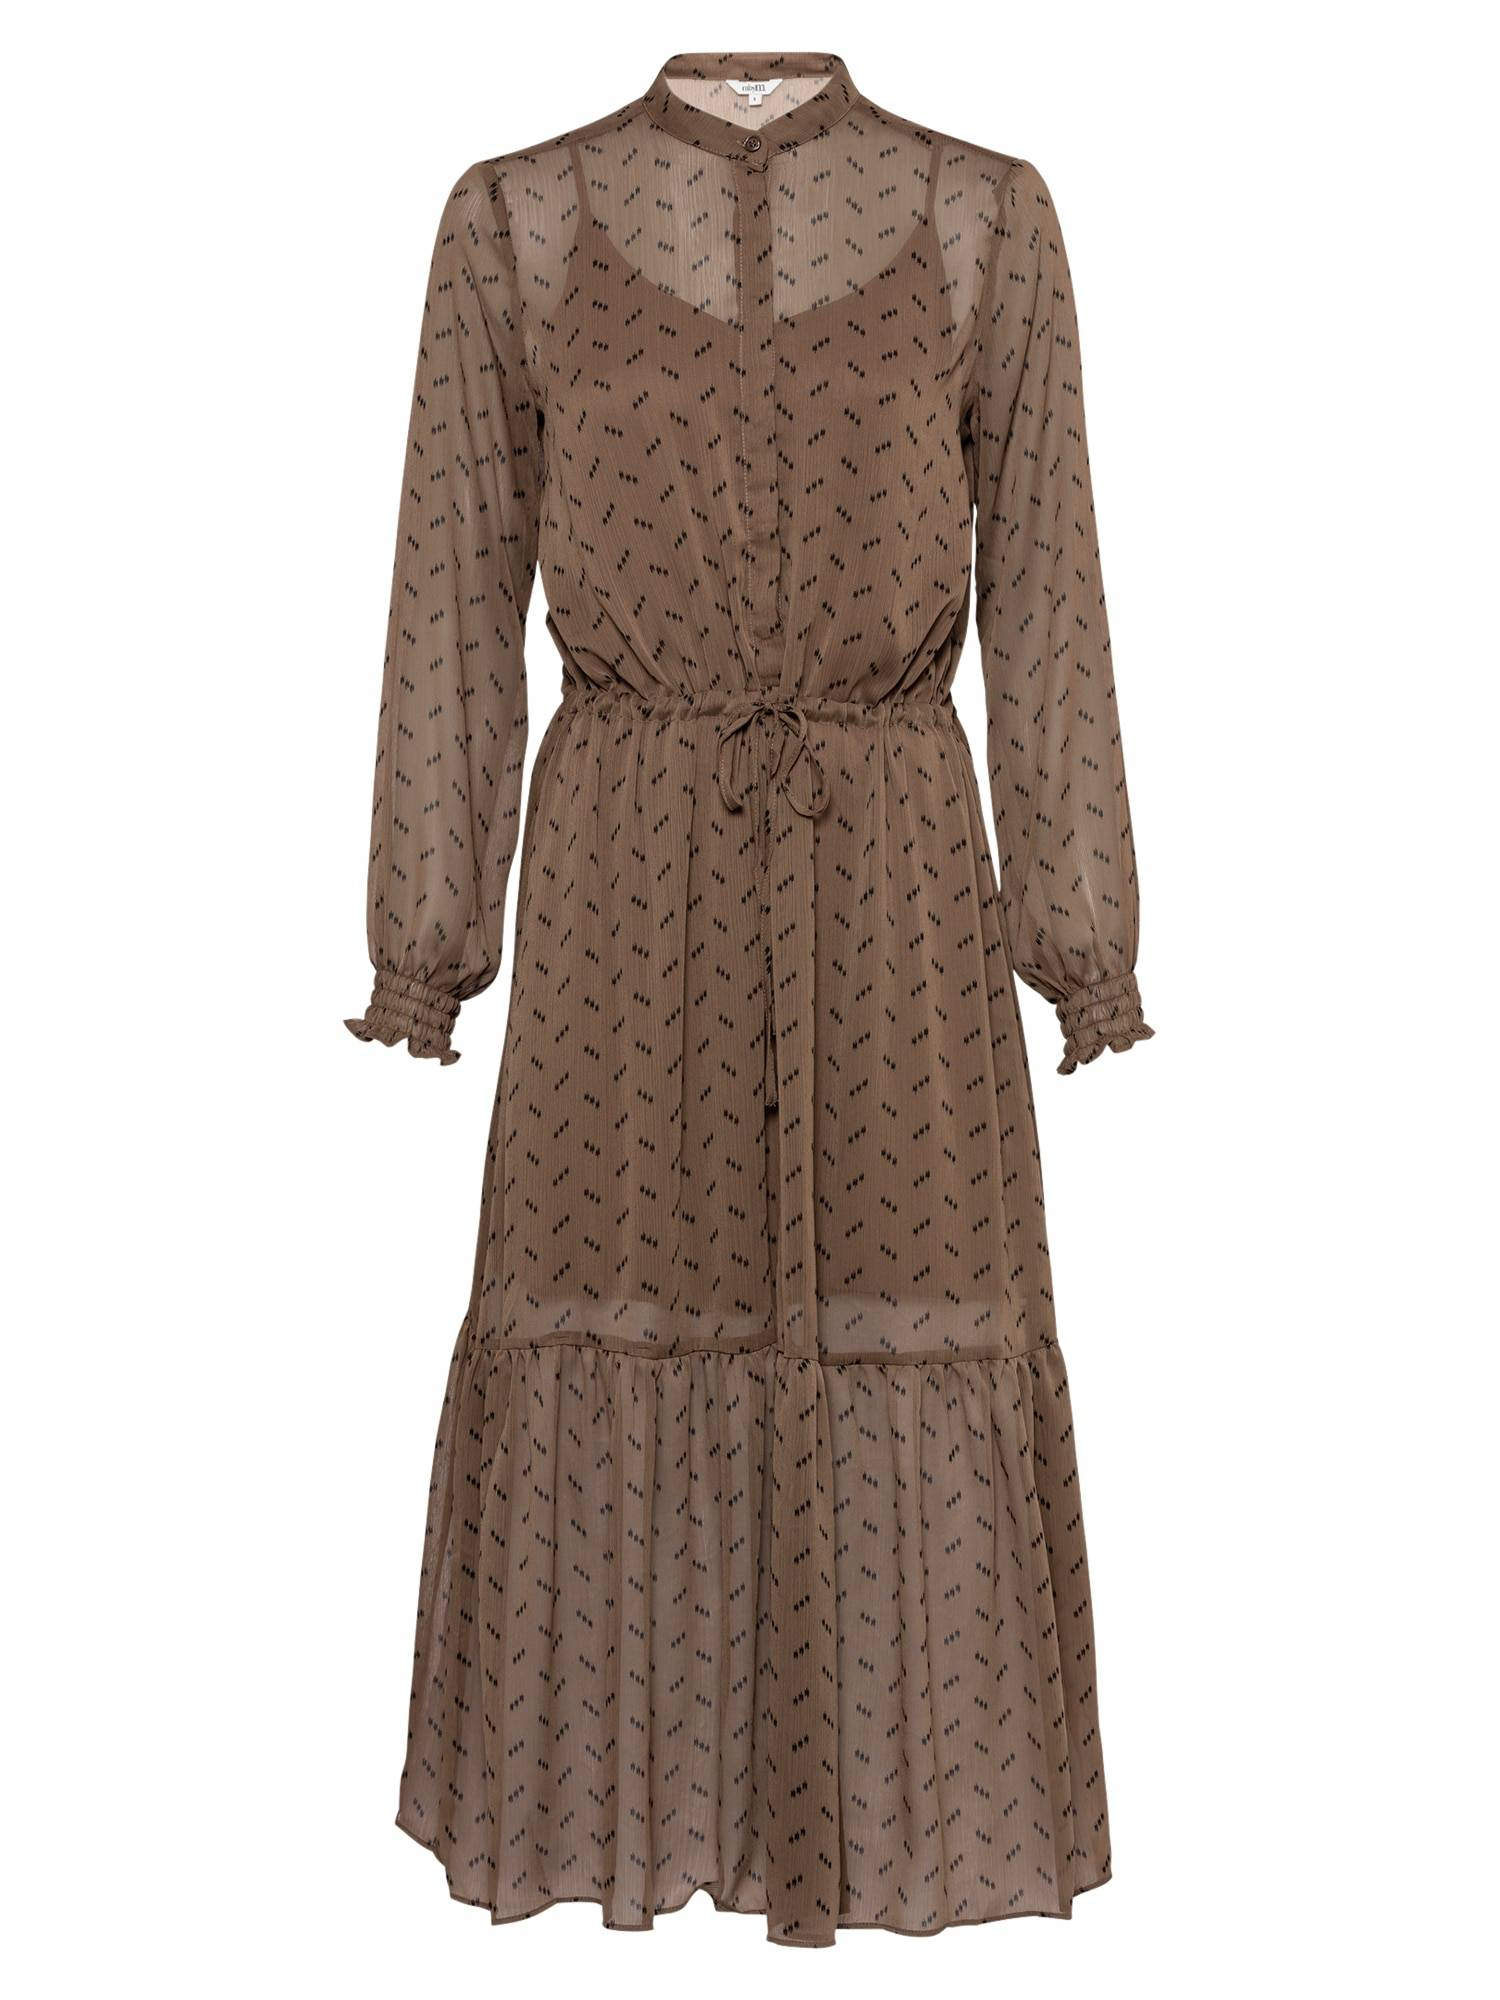 mbym Robe-chemise 'Diaz'  - Marron - Taille: XS - female